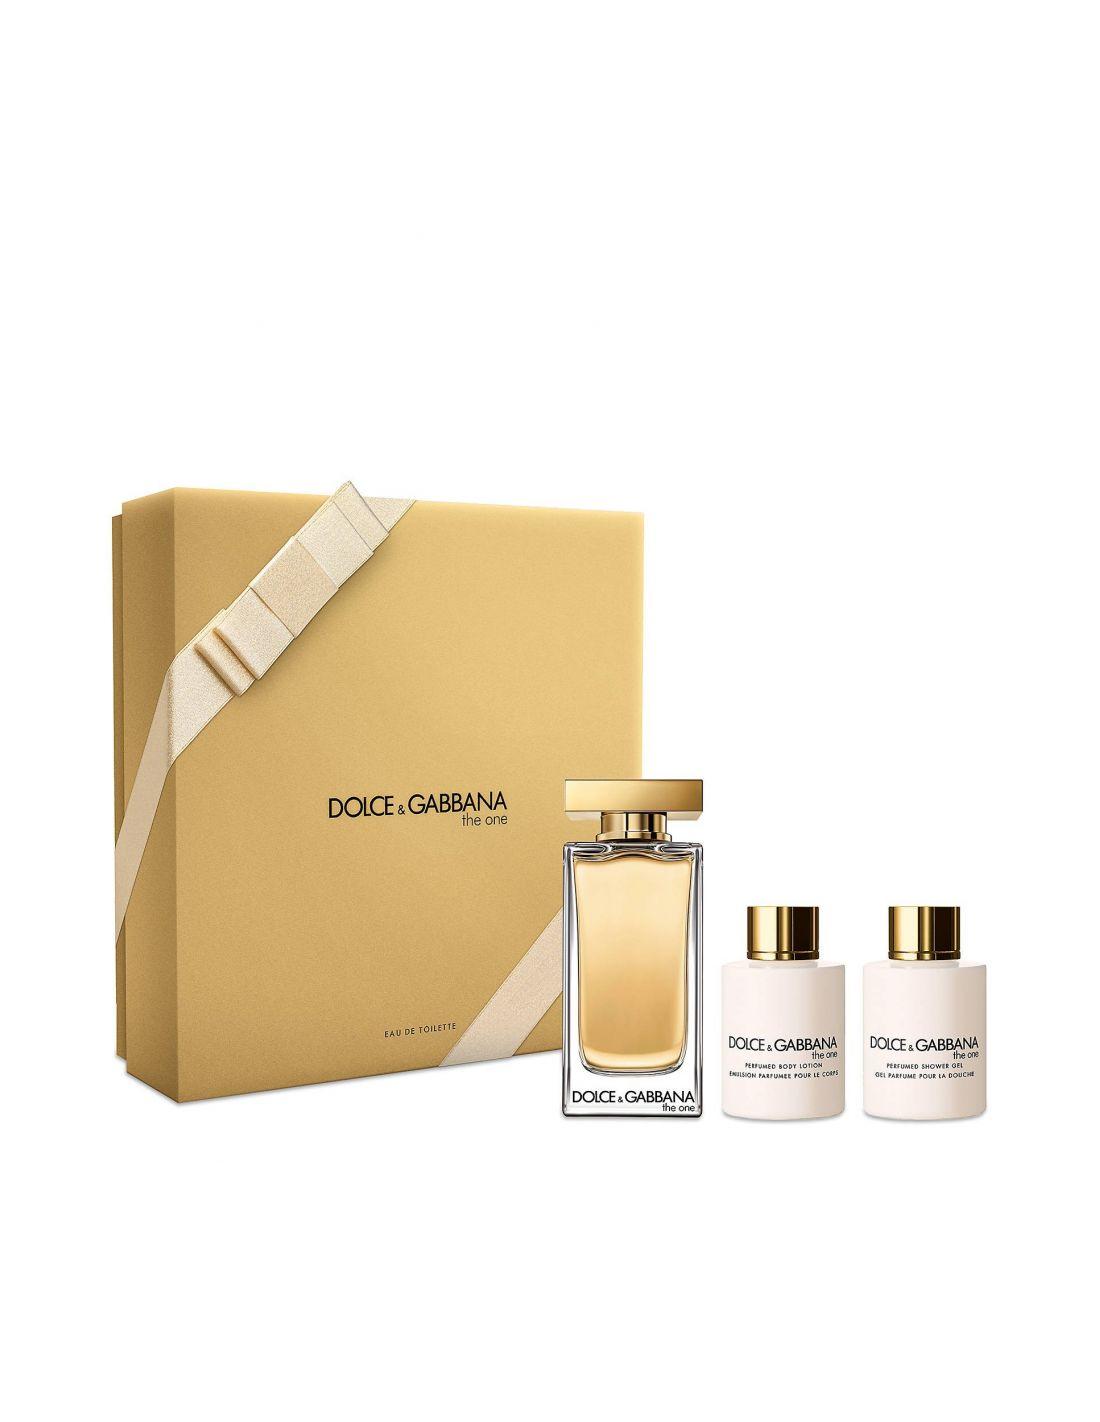 Coffret Dolce   Gabbana The One Eau de Toilette 100ml + Body Lotion 100ml +  Shower 7e18ba9997